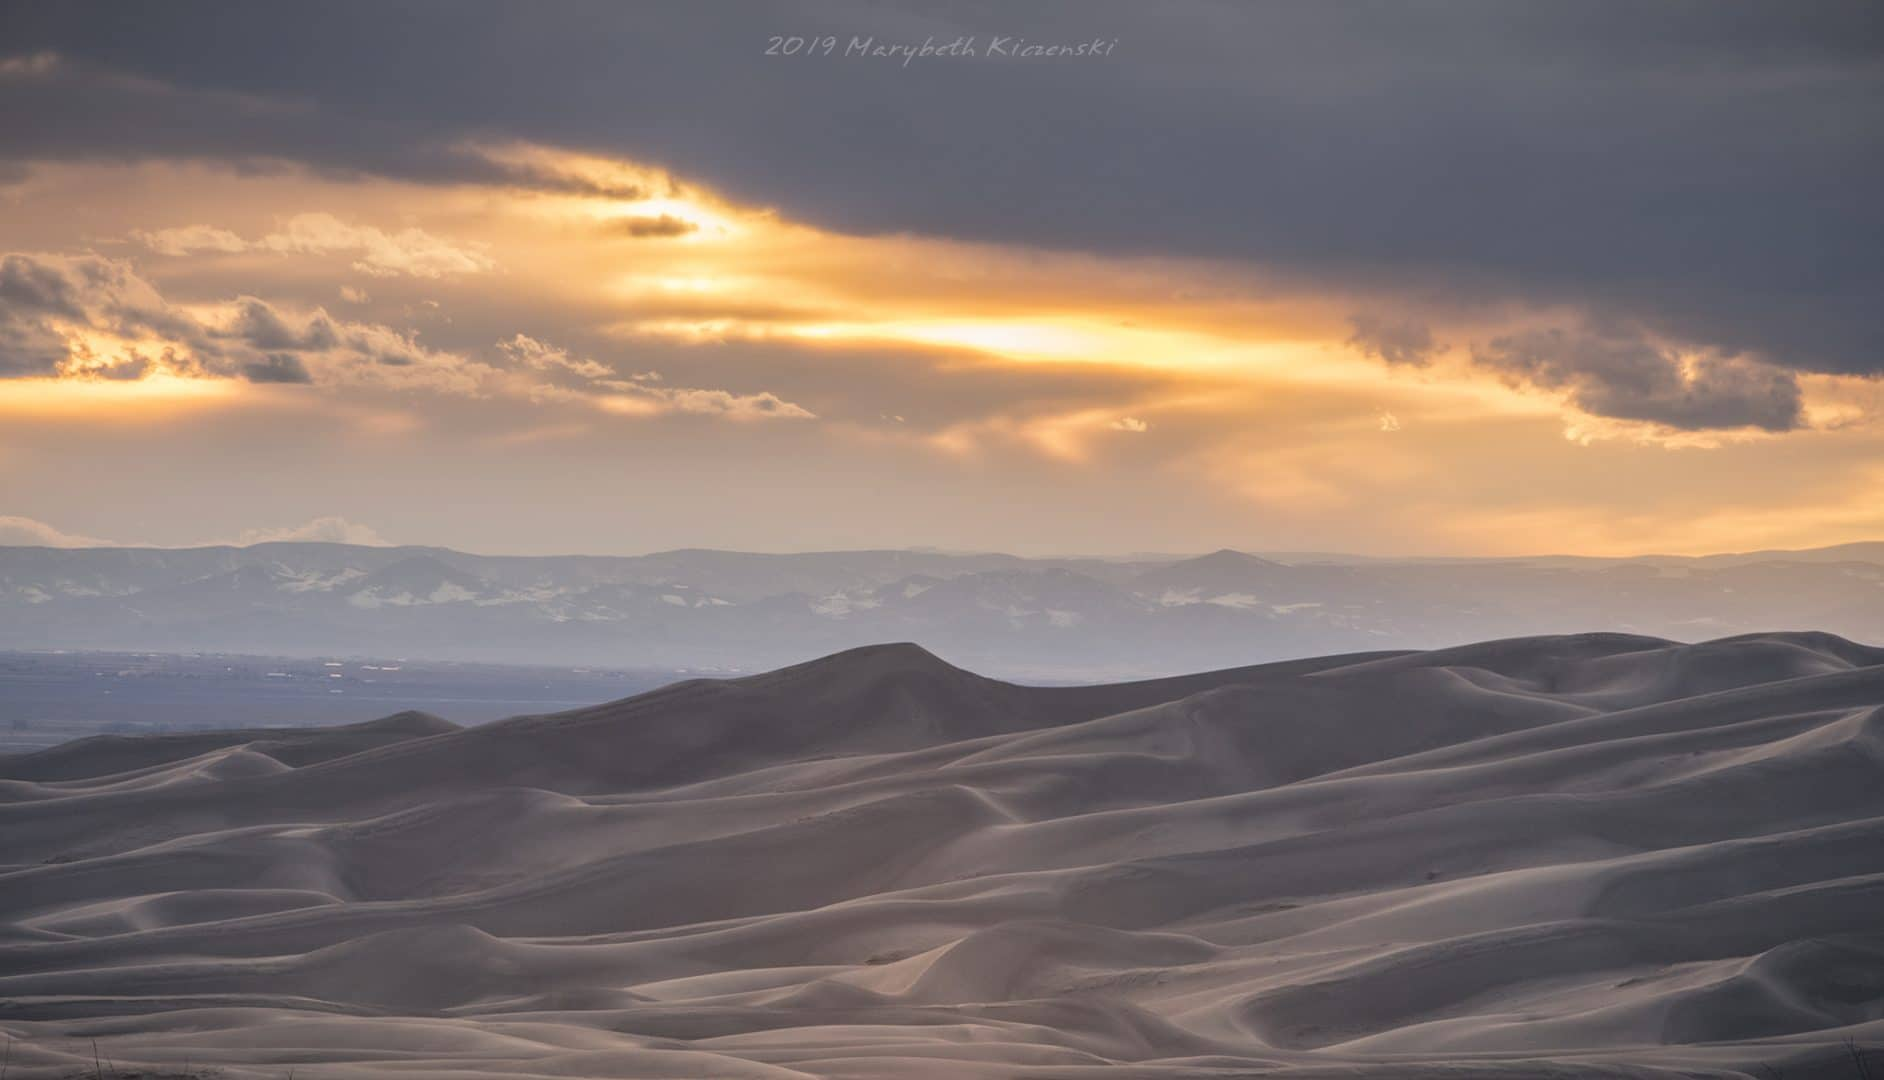 2019 Copyright MaryBeth Kiczenski. A cloudy sunset over the dune field.